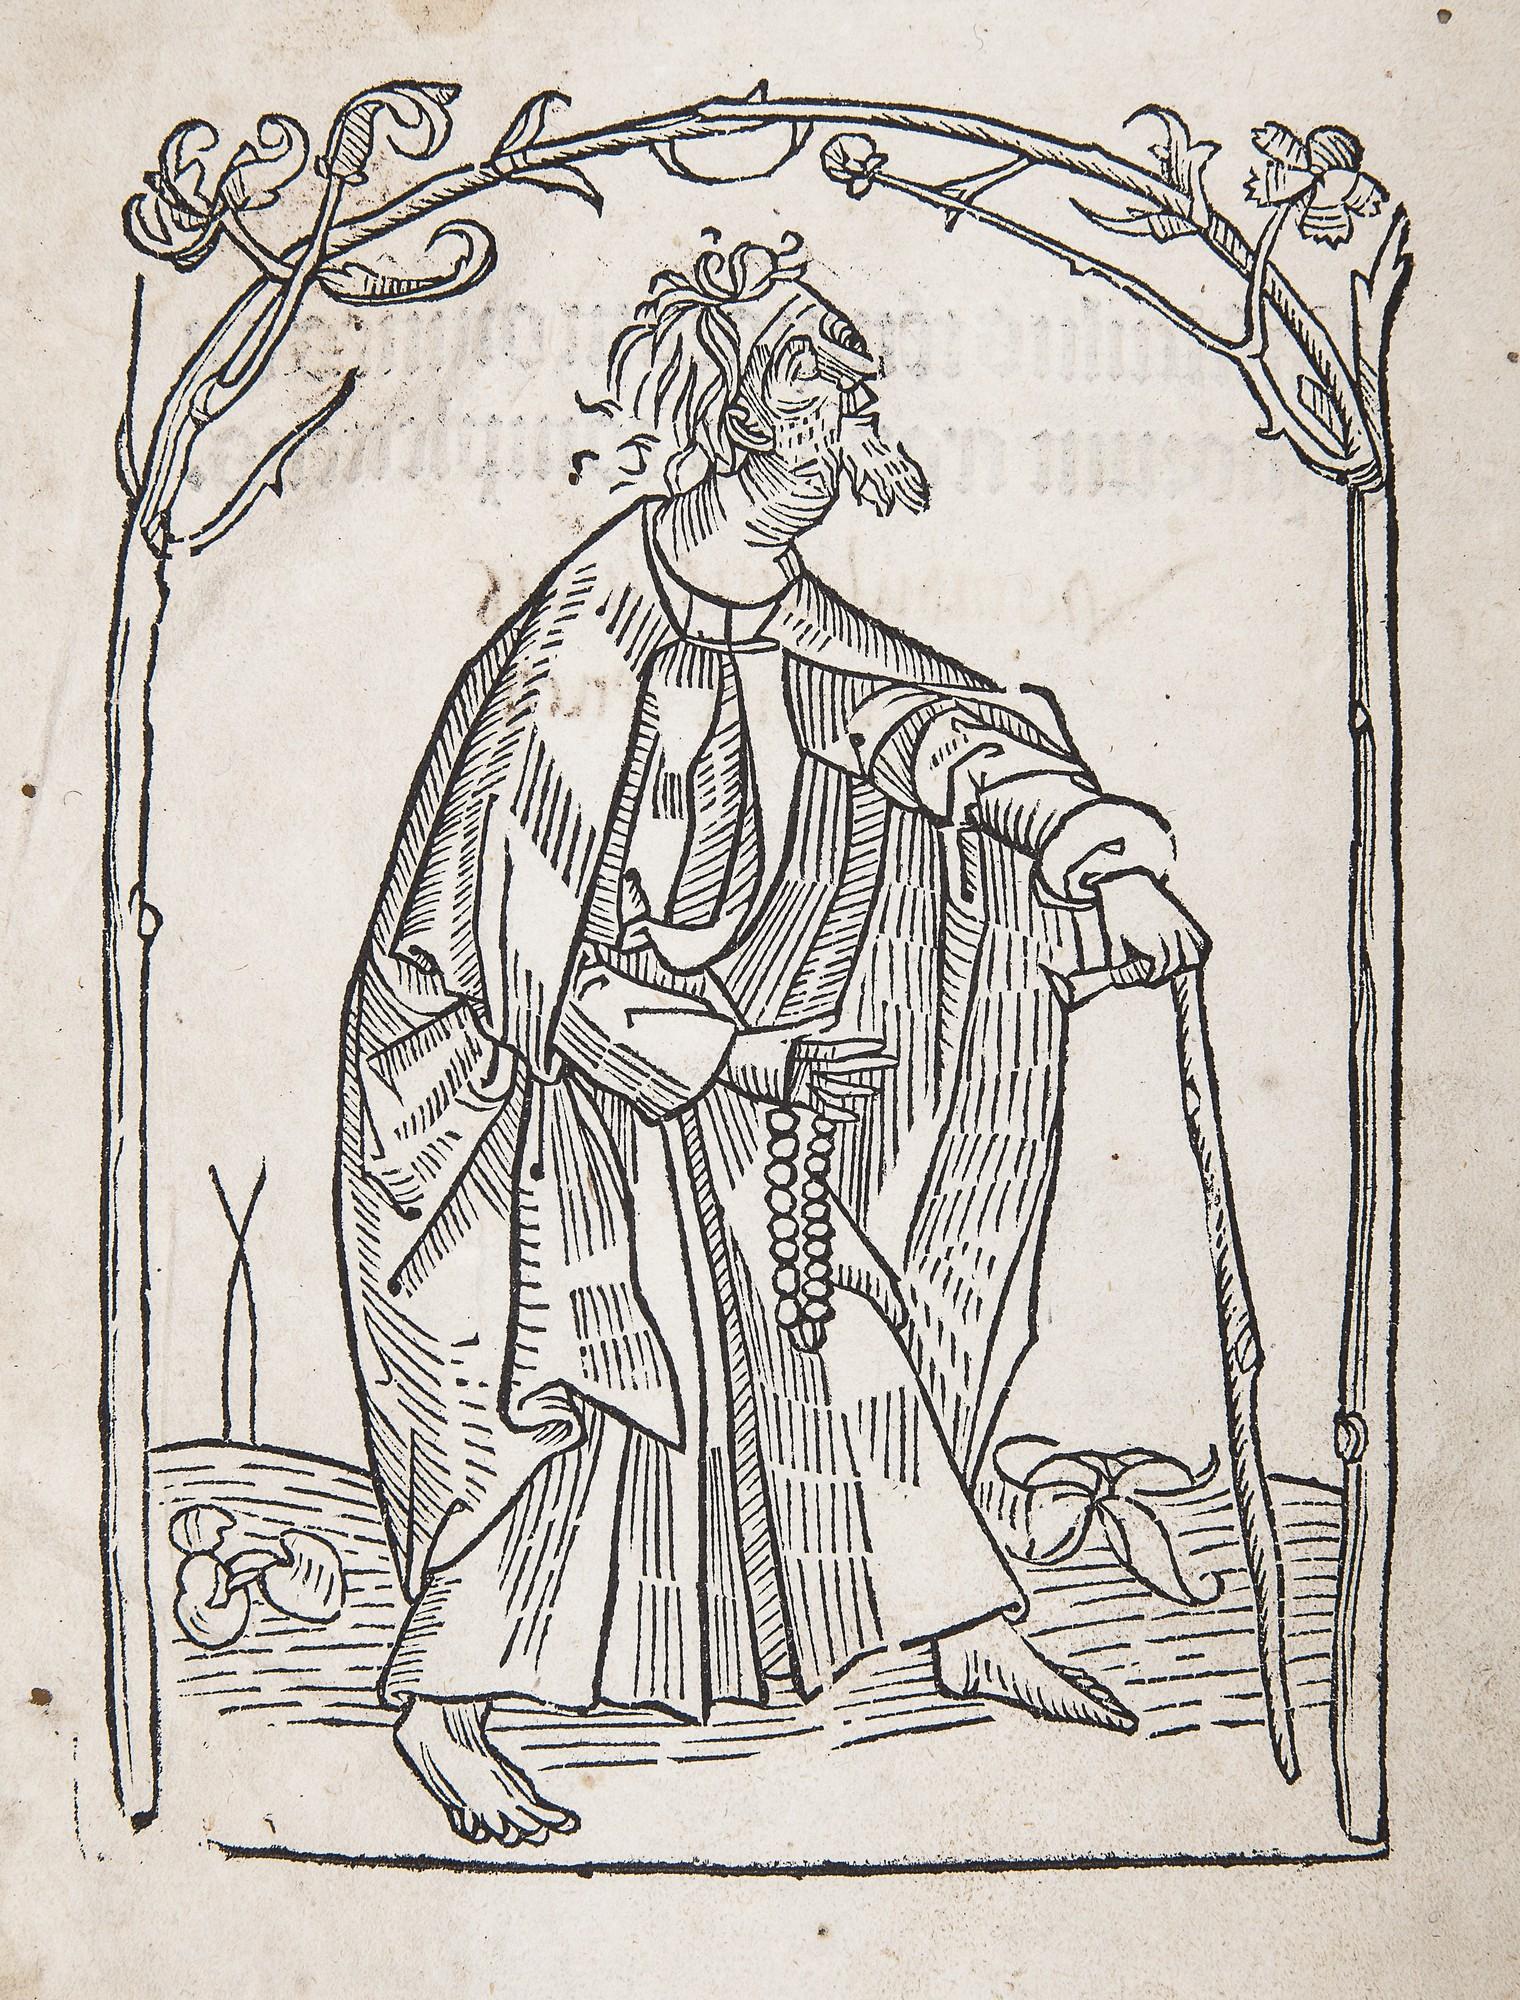 Werner Rolewinck, Fasciculus Temporum. Strassburg, ok. 1490 – mnich pielgrzym, drzeworyt, fot. MNK (źródło: materiały prasowe organizatora)